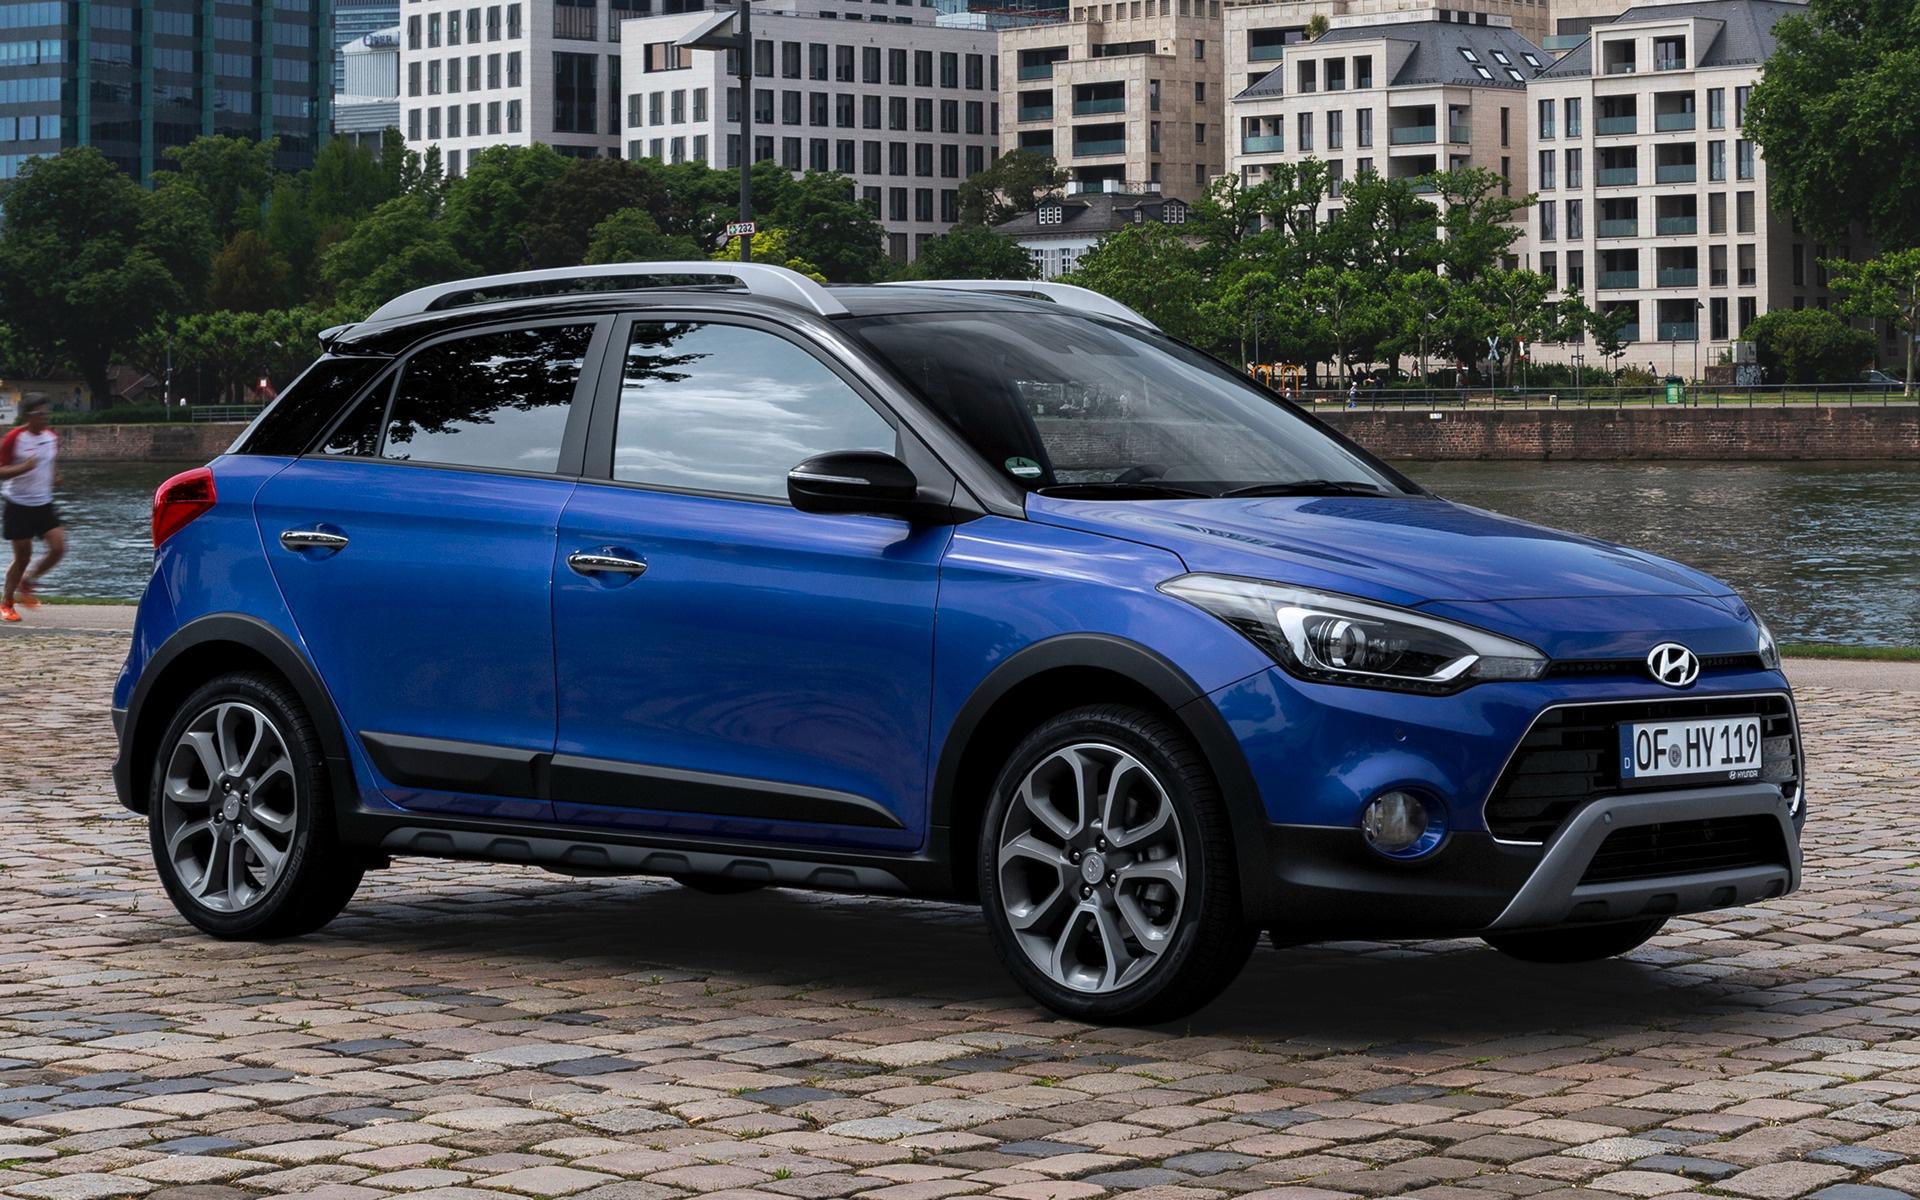 2018 Hyundai i20 Active   Wallpapers and HD Images Car Pixel 1920x1200